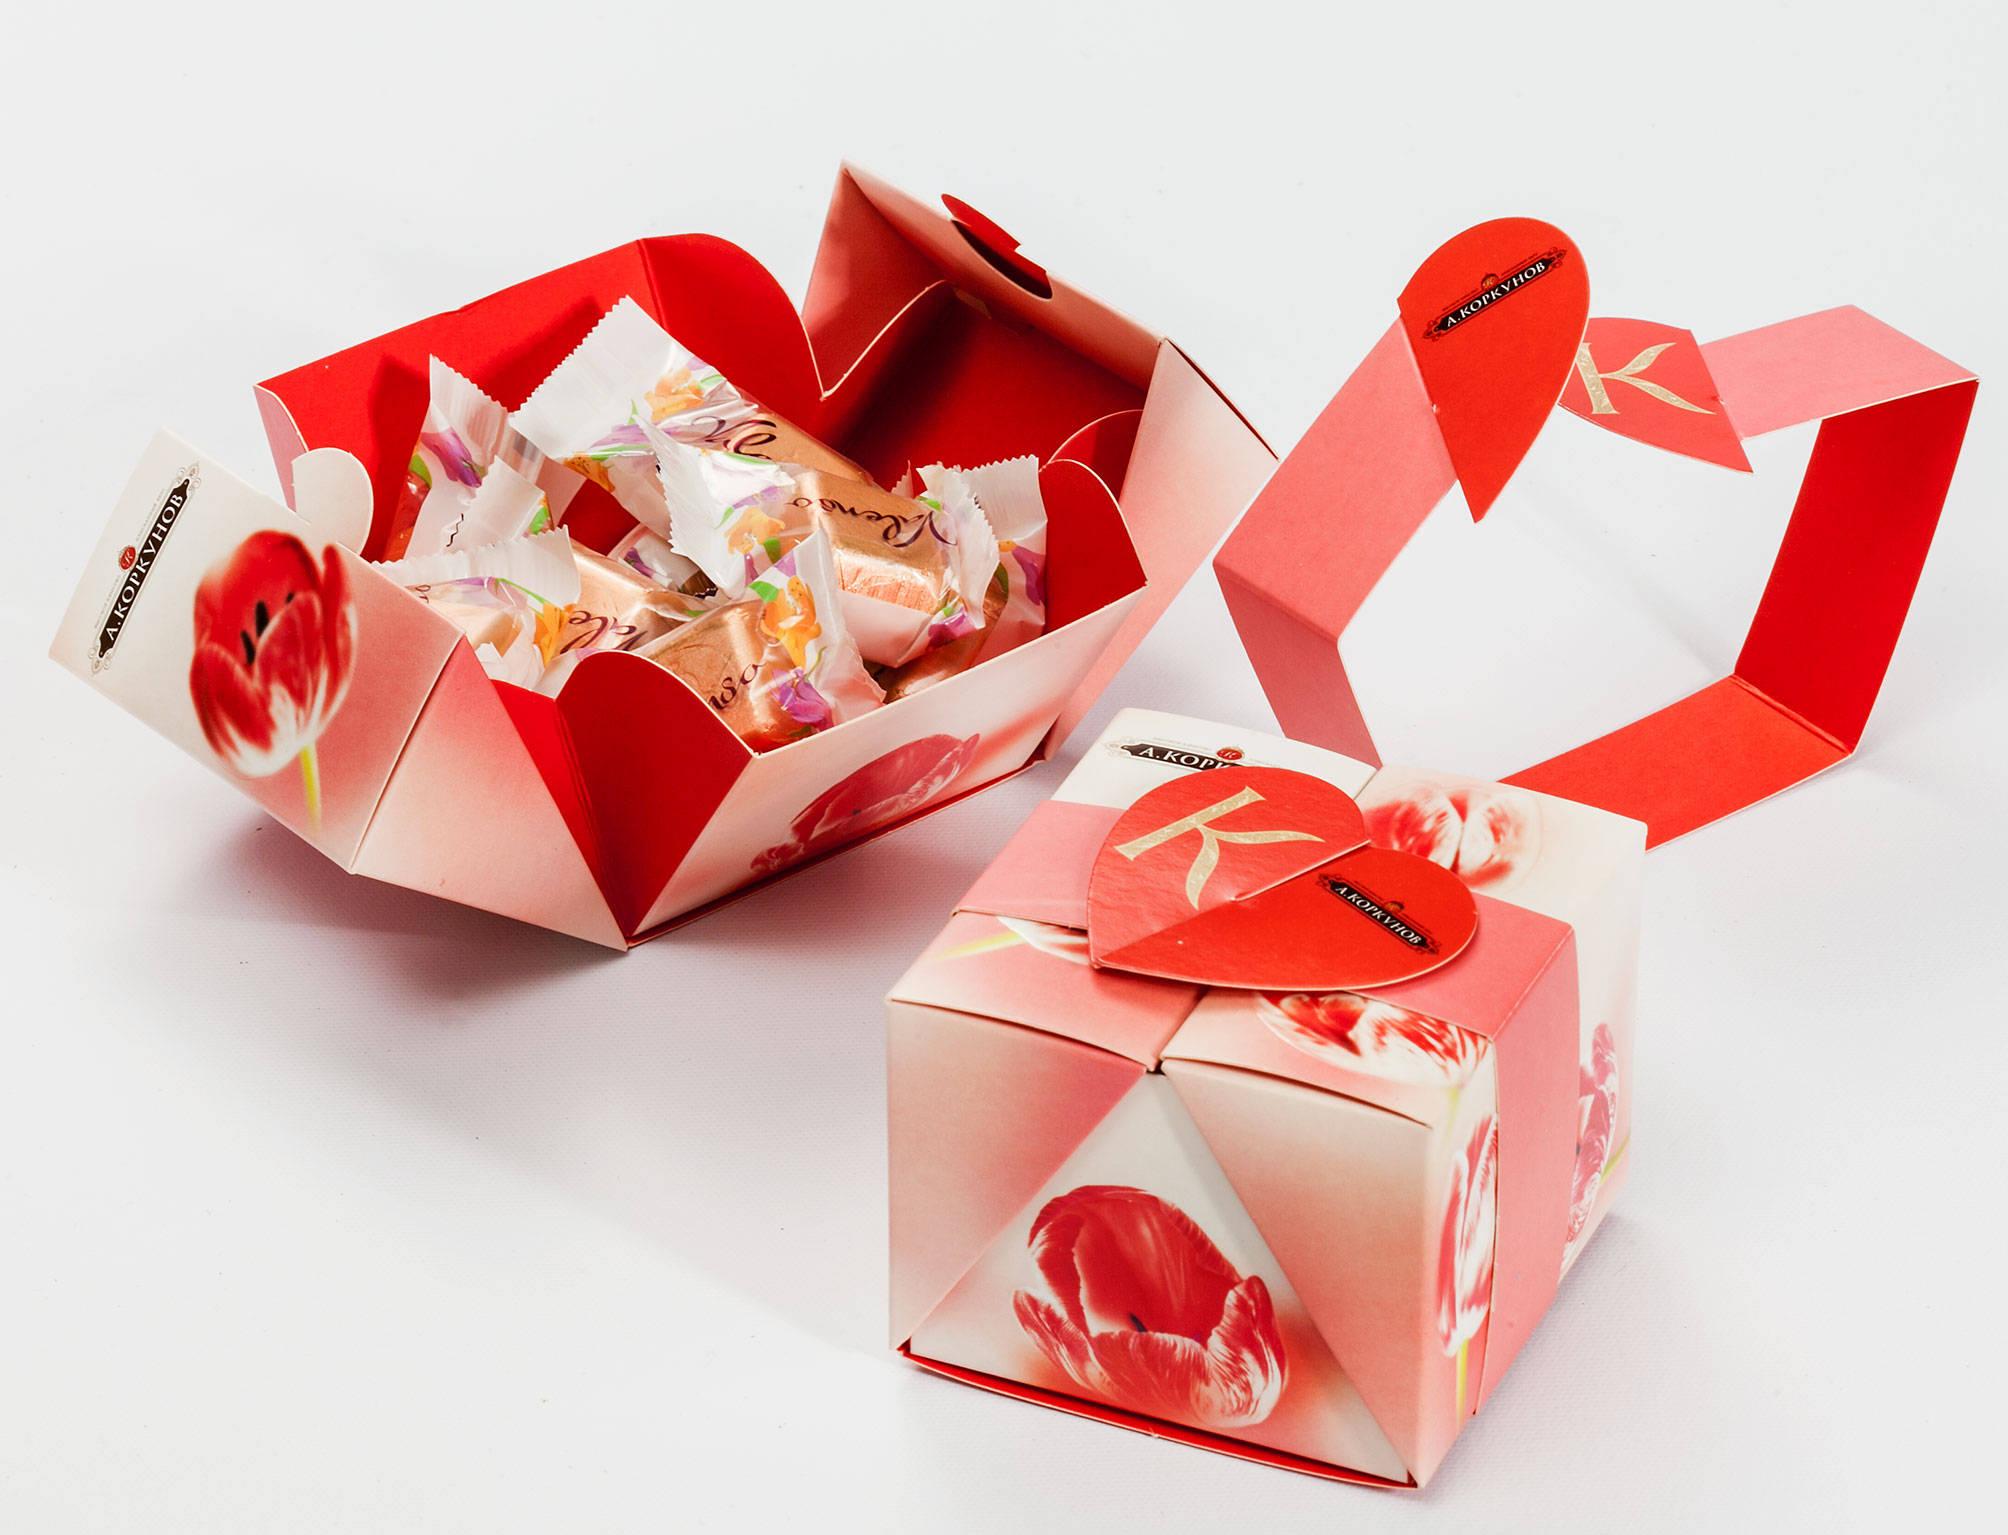 Mayr-Melnhof Packaging International GmbH